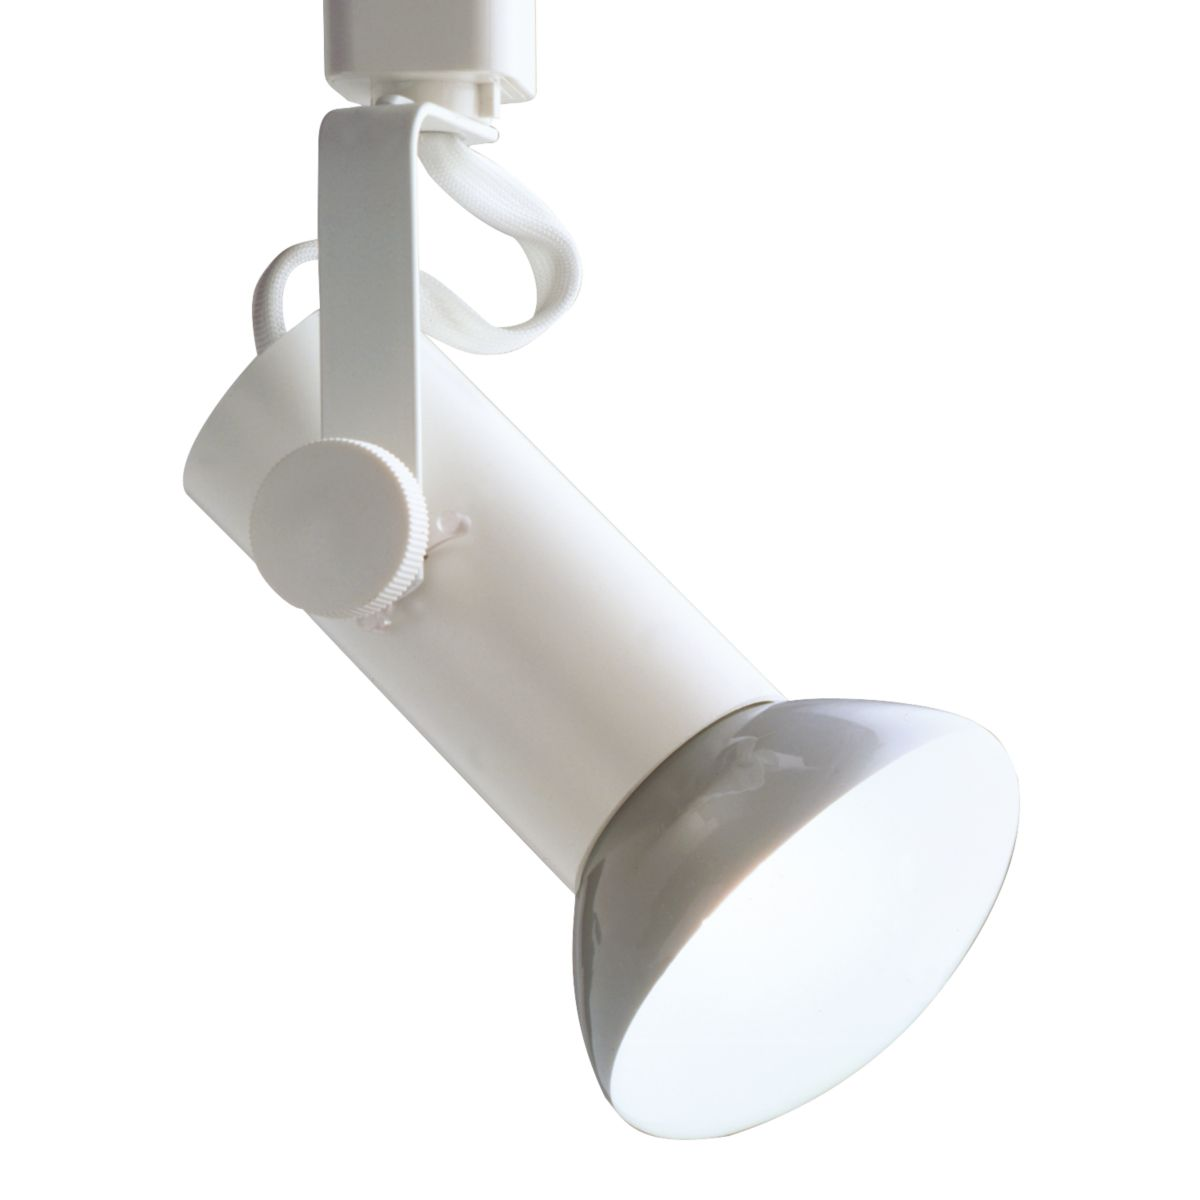 L1700 Universal Lampholder